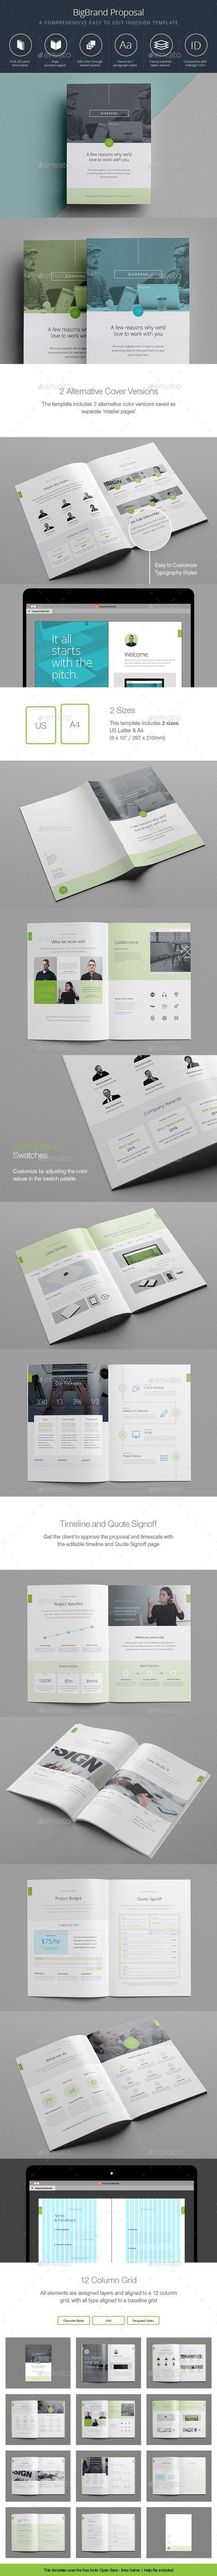 BigBrand Proposal Template #design Download: http://graphicriver.net/item/bigbrand-proposal/12041988?ref=ksioks